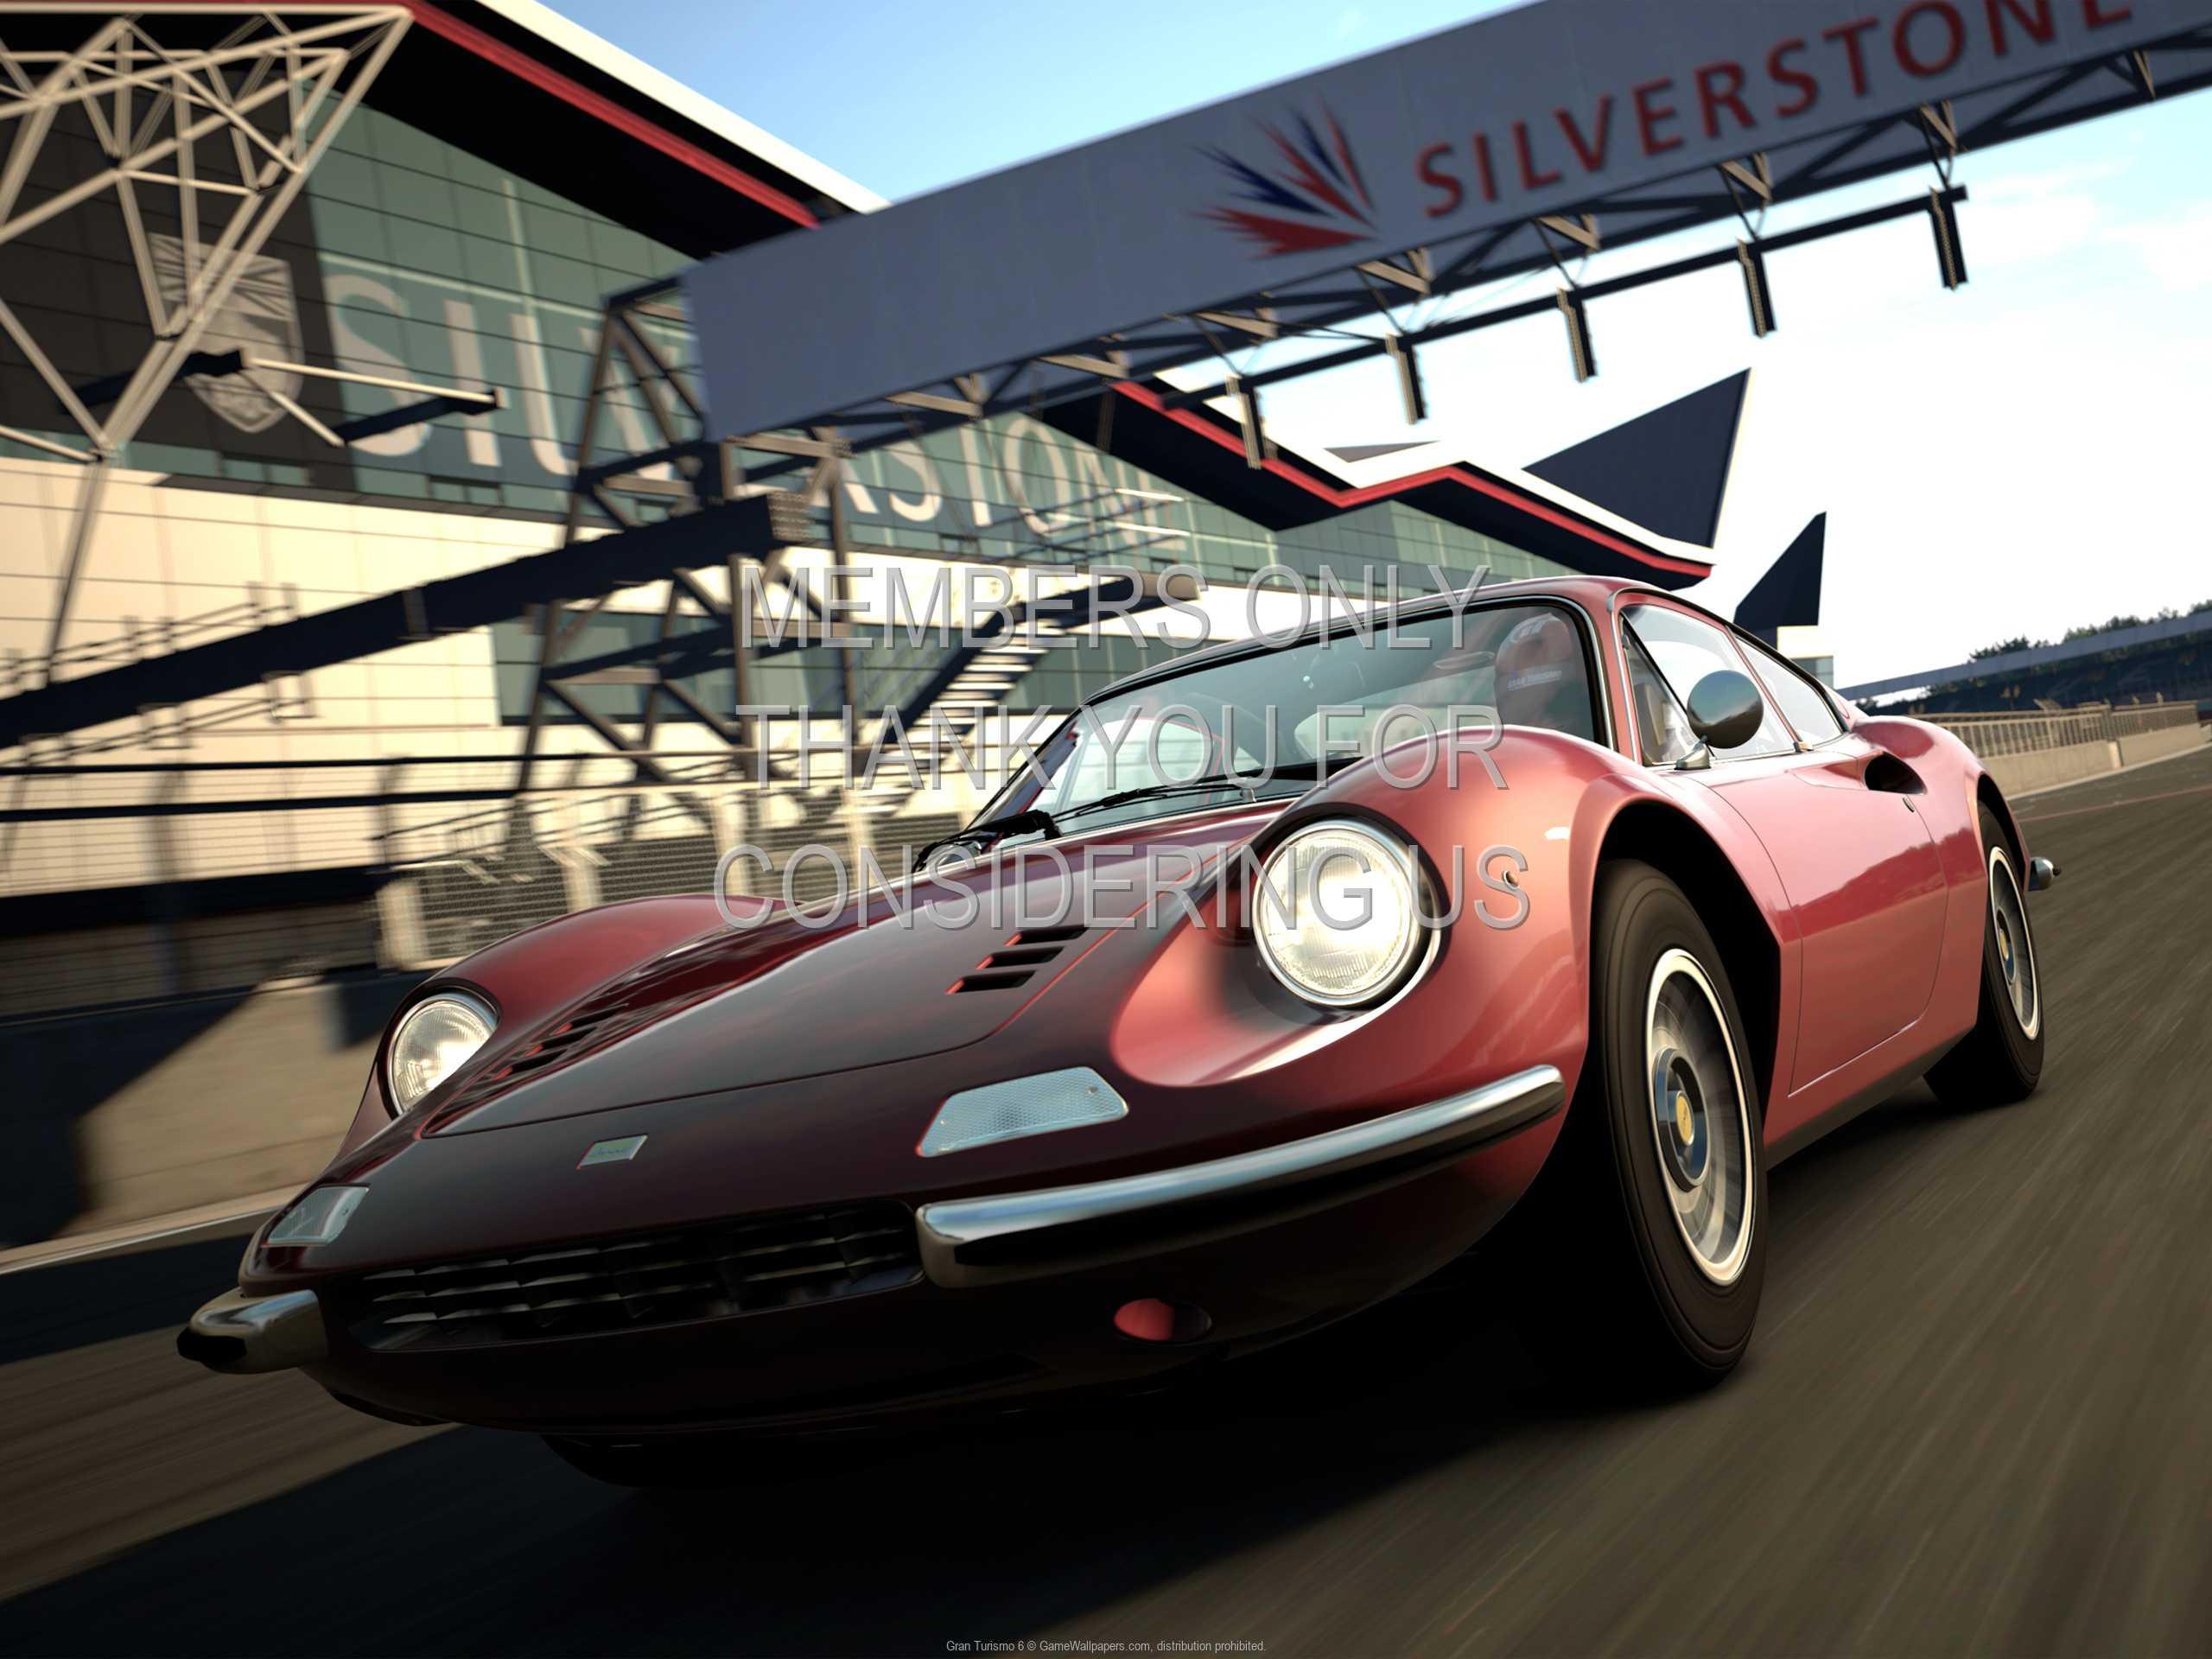 Gran Turismo 6 1080p Horizontal Handy Hintergrundbild 02